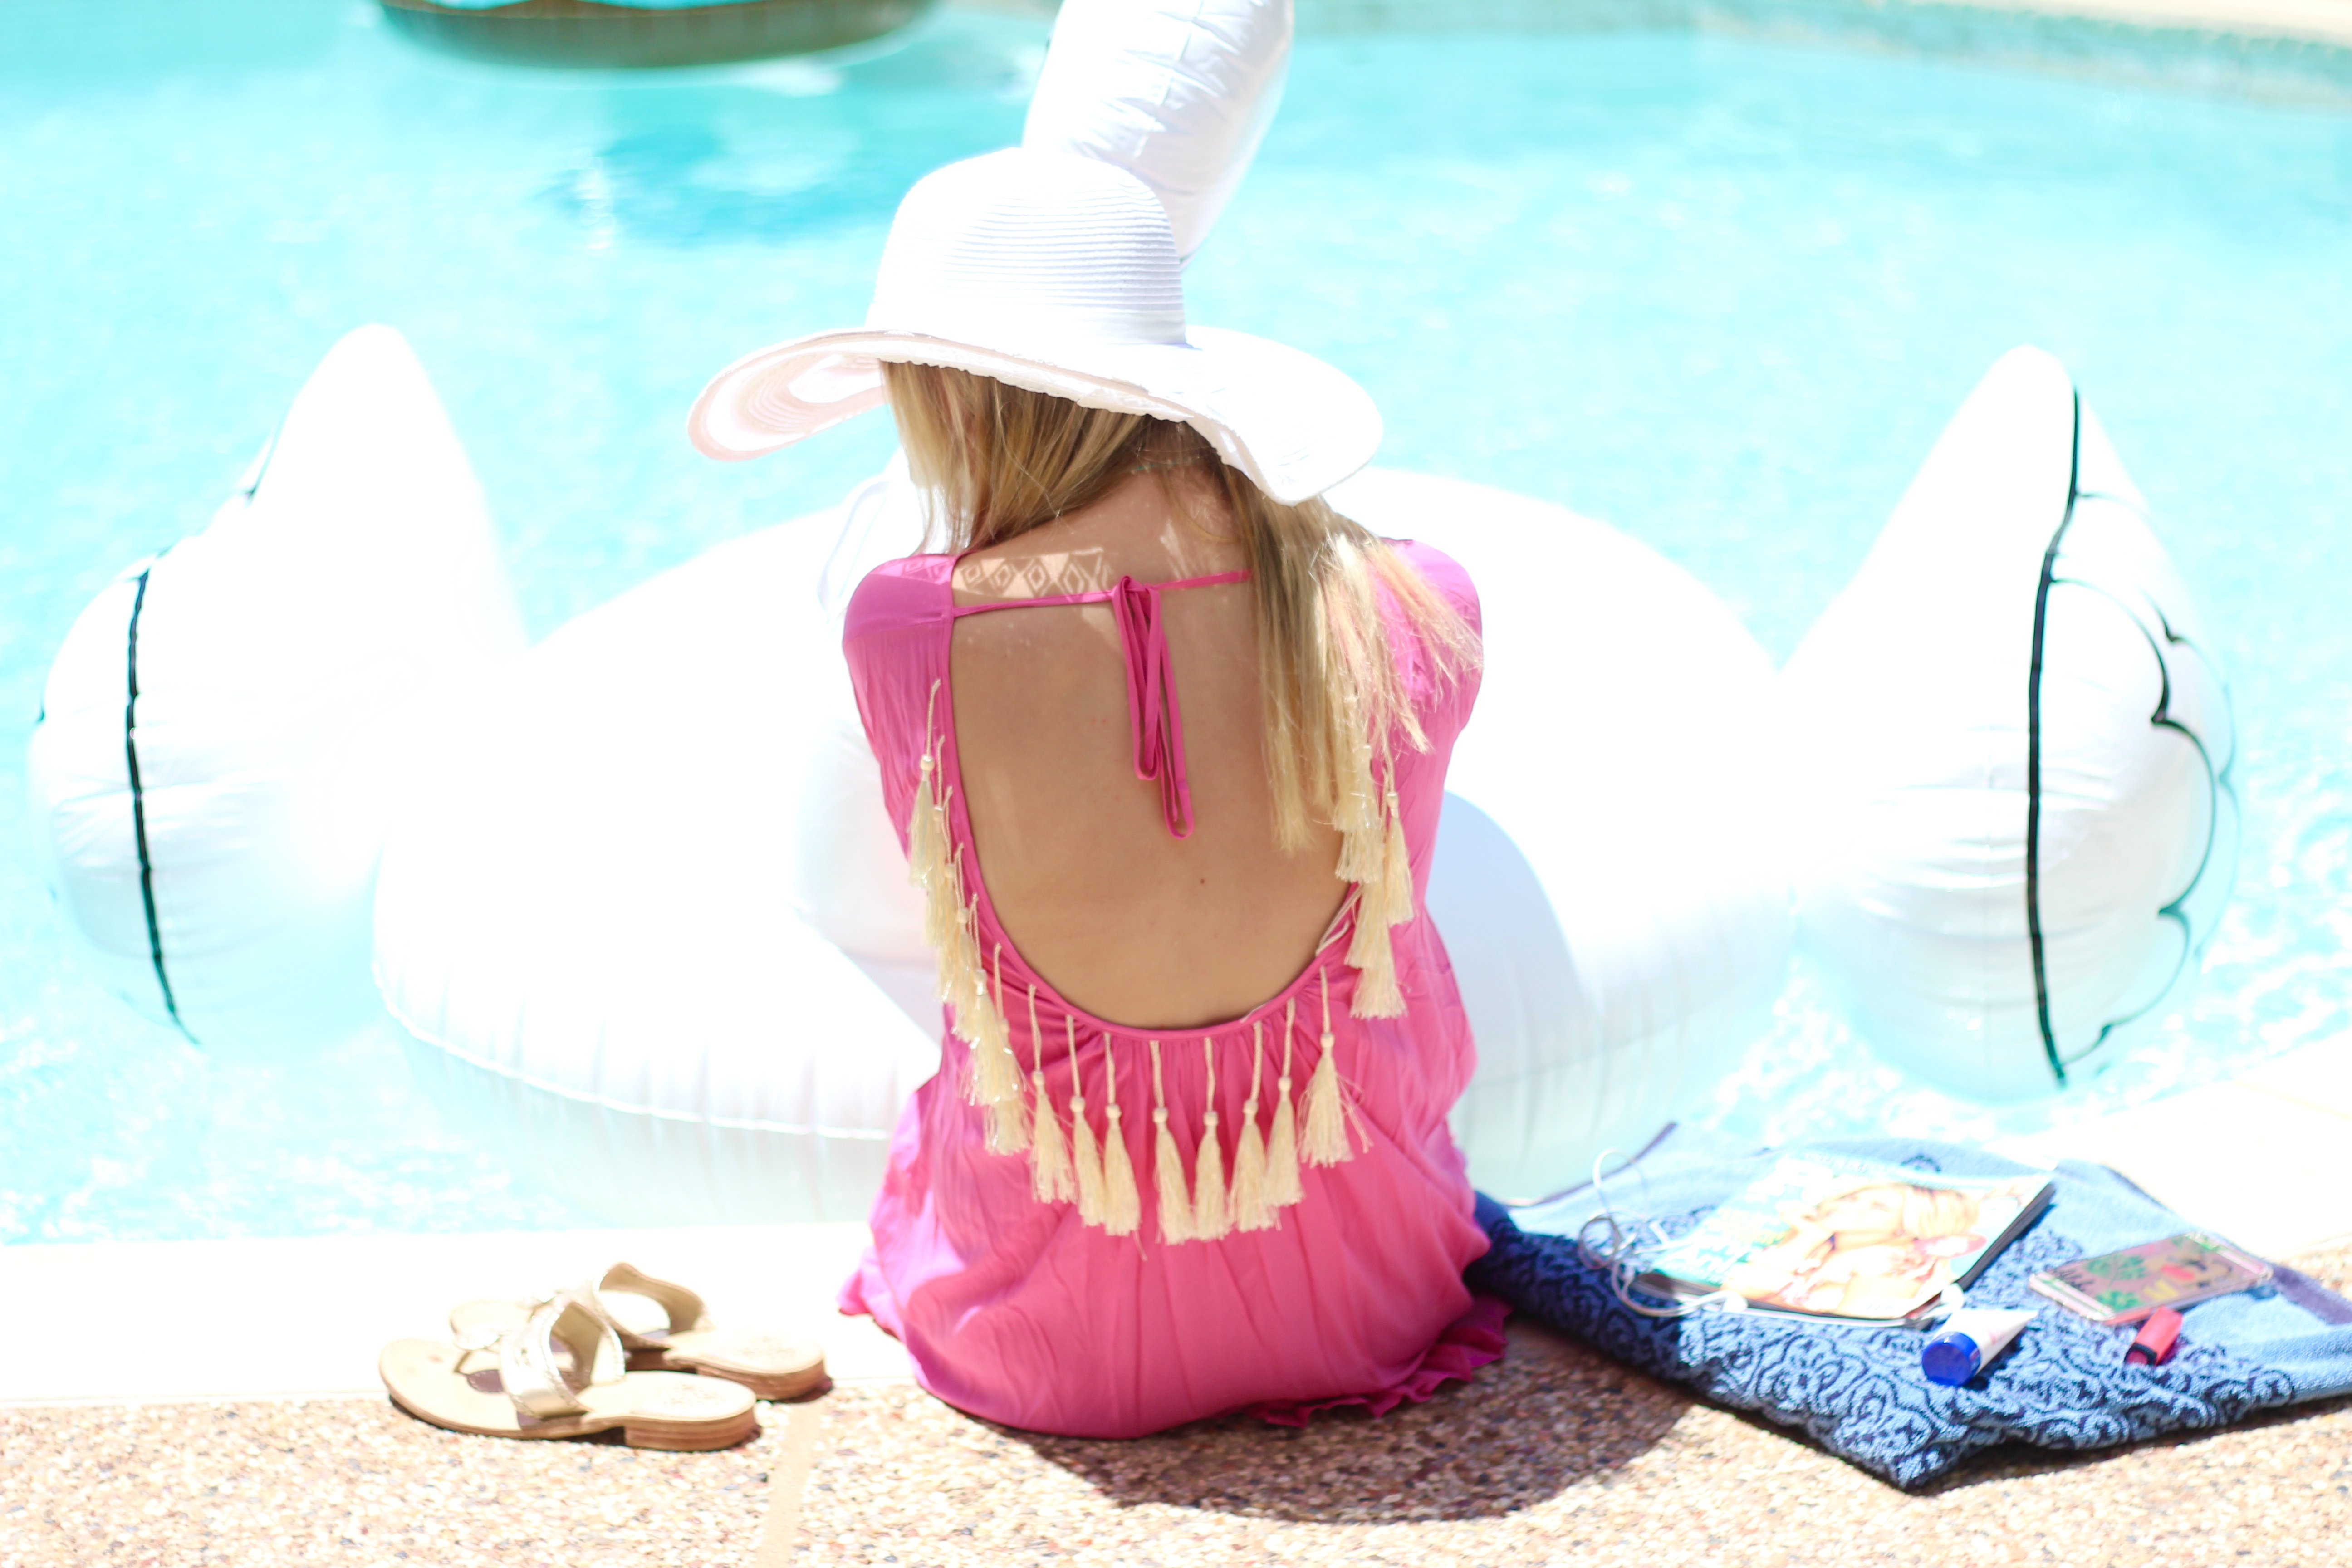 poolside in tassels | Audrey Madison Stowe Blog